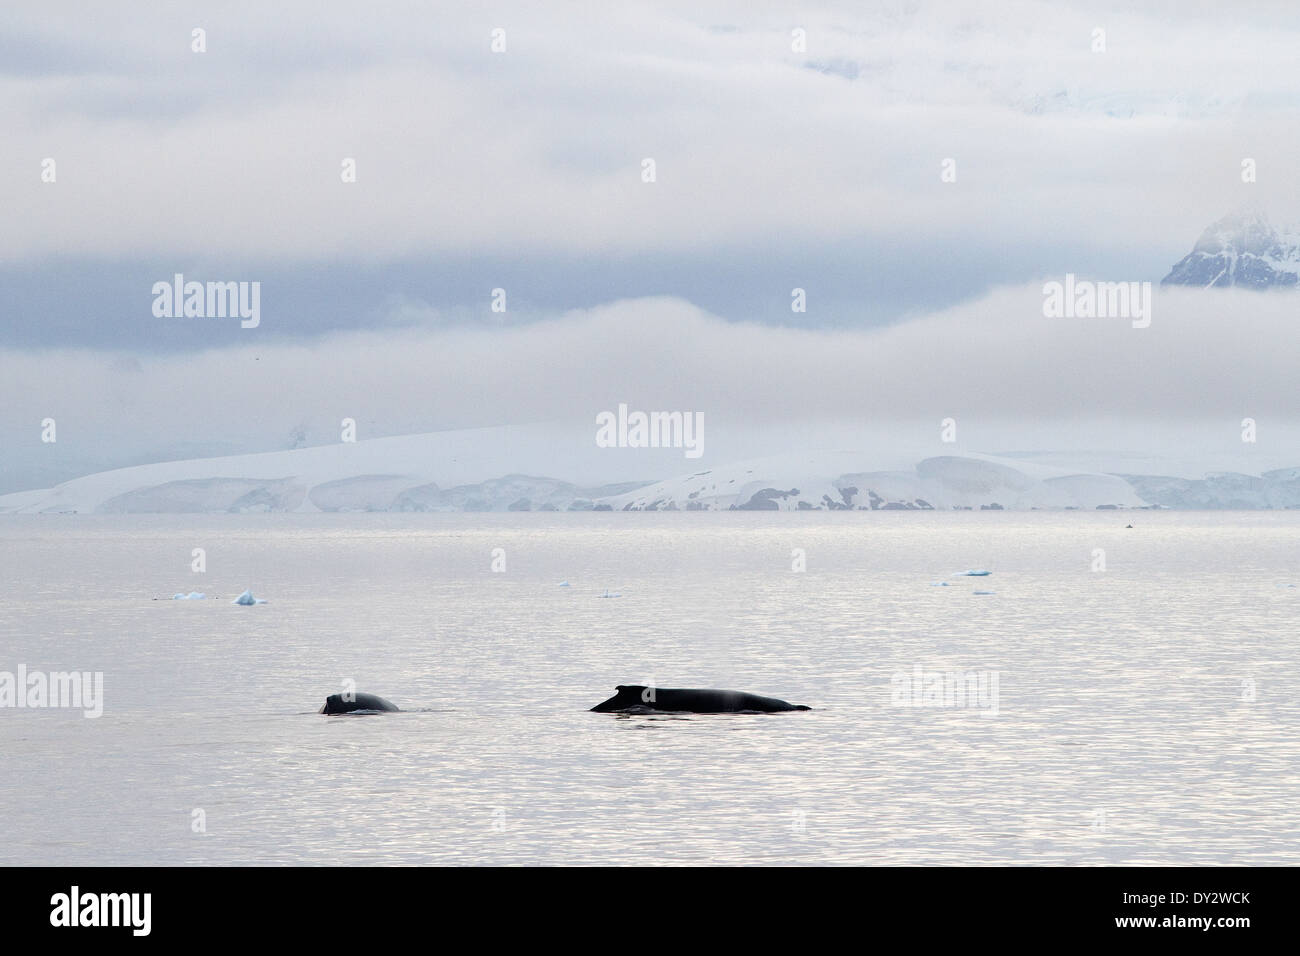 Antarctica whales, Humpback whales Antarctic, Megaptera novaeangliae. - Stock Image